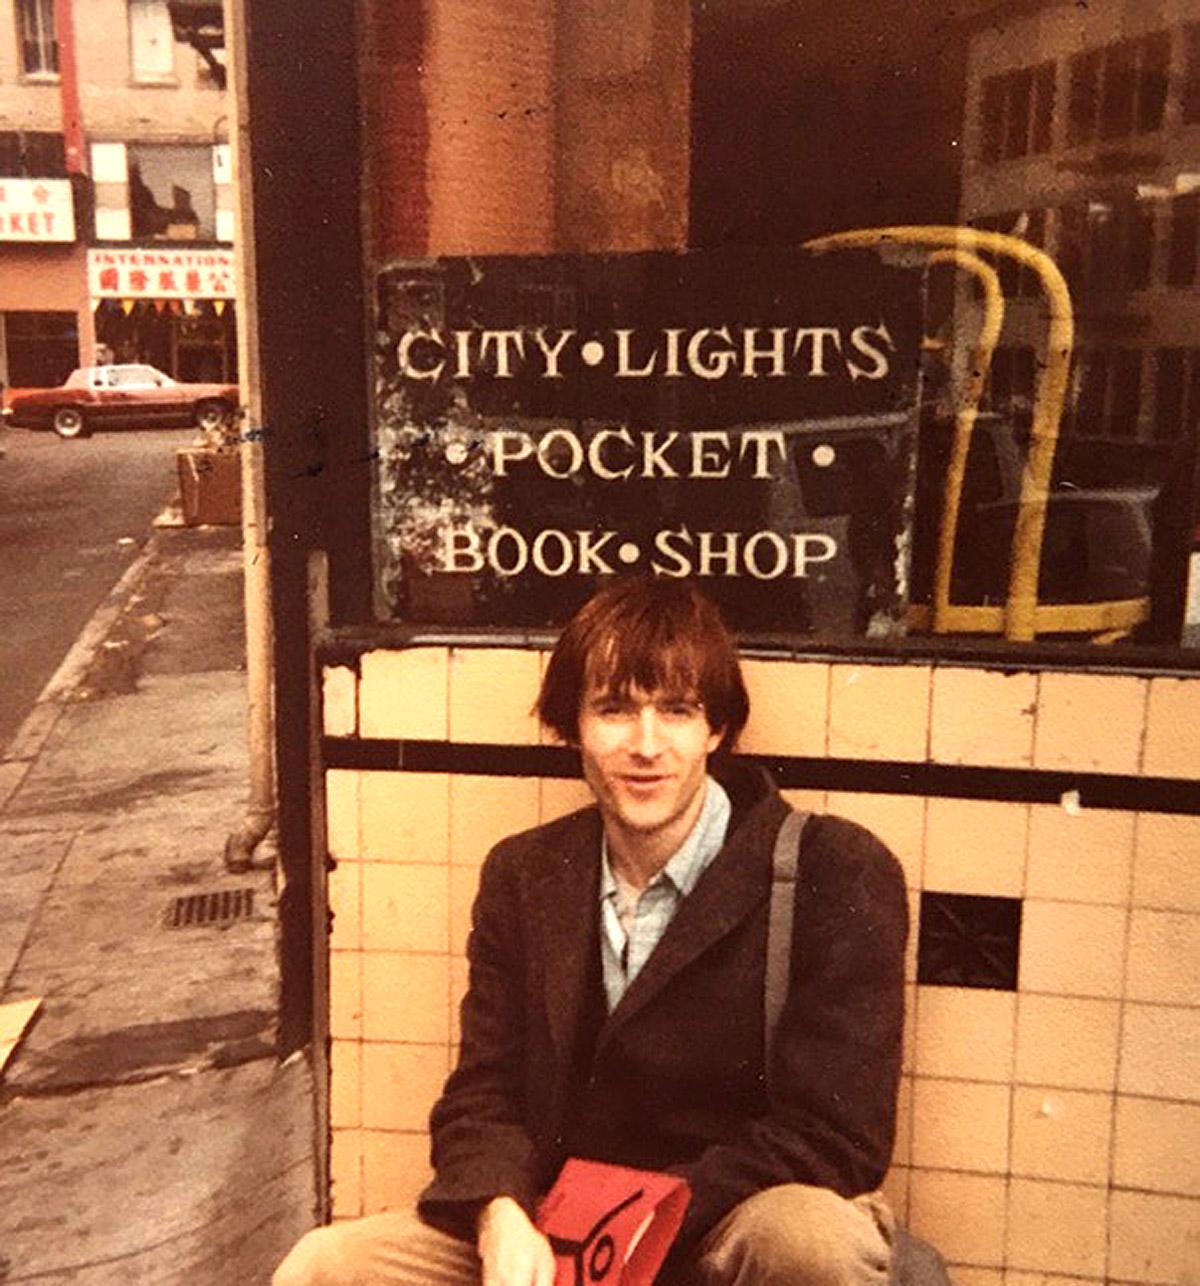 Simon Pettet at City Lights